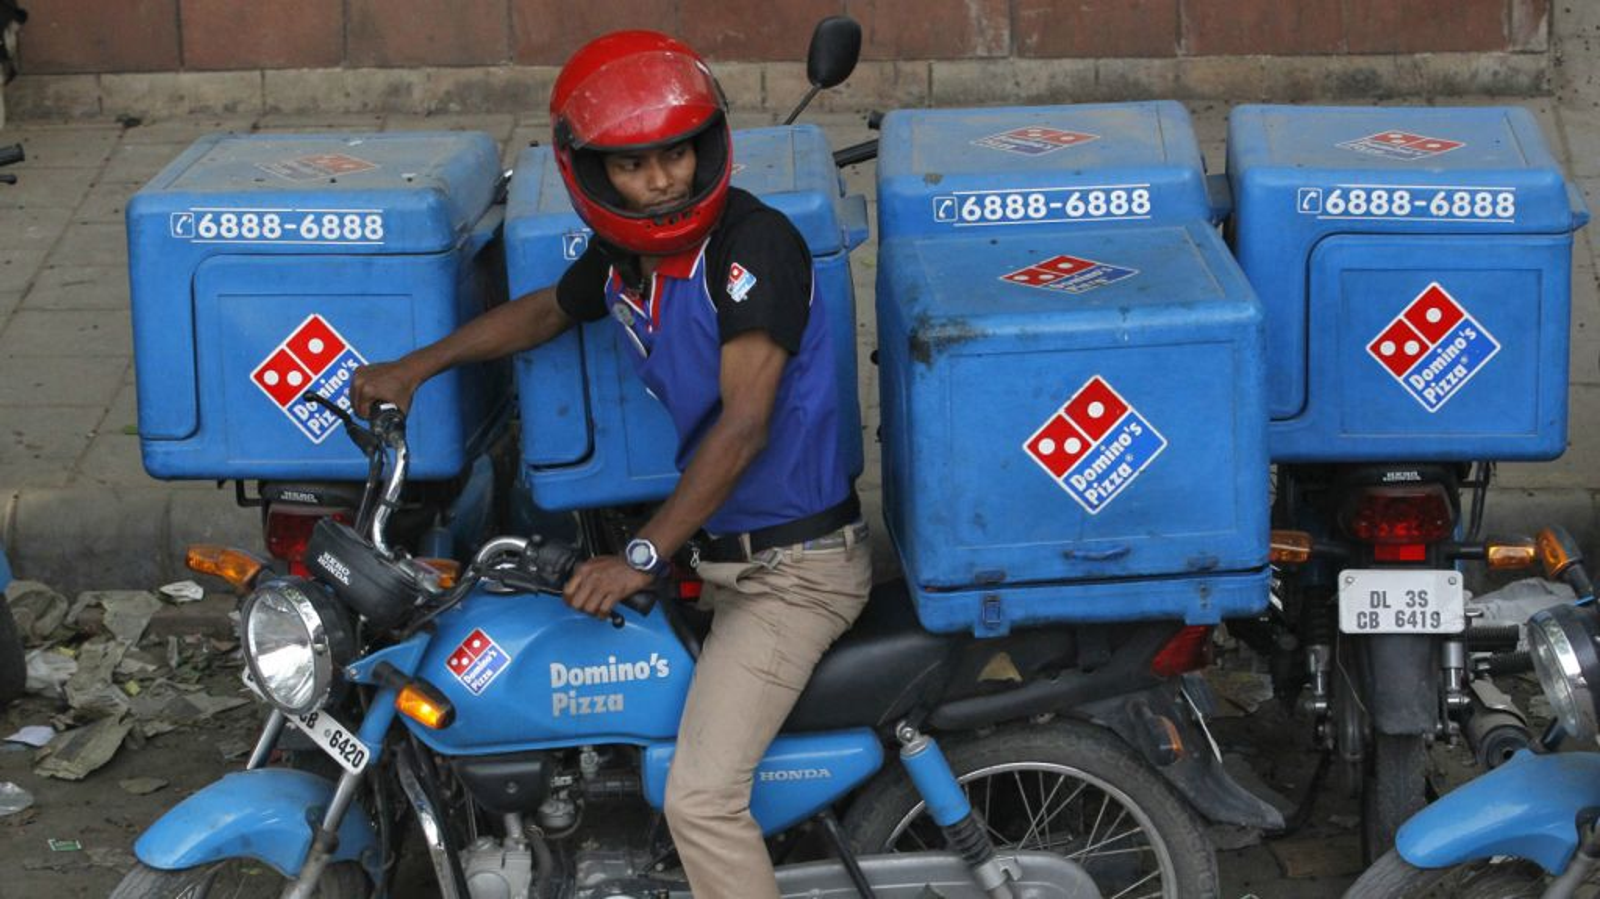 India, Domino's